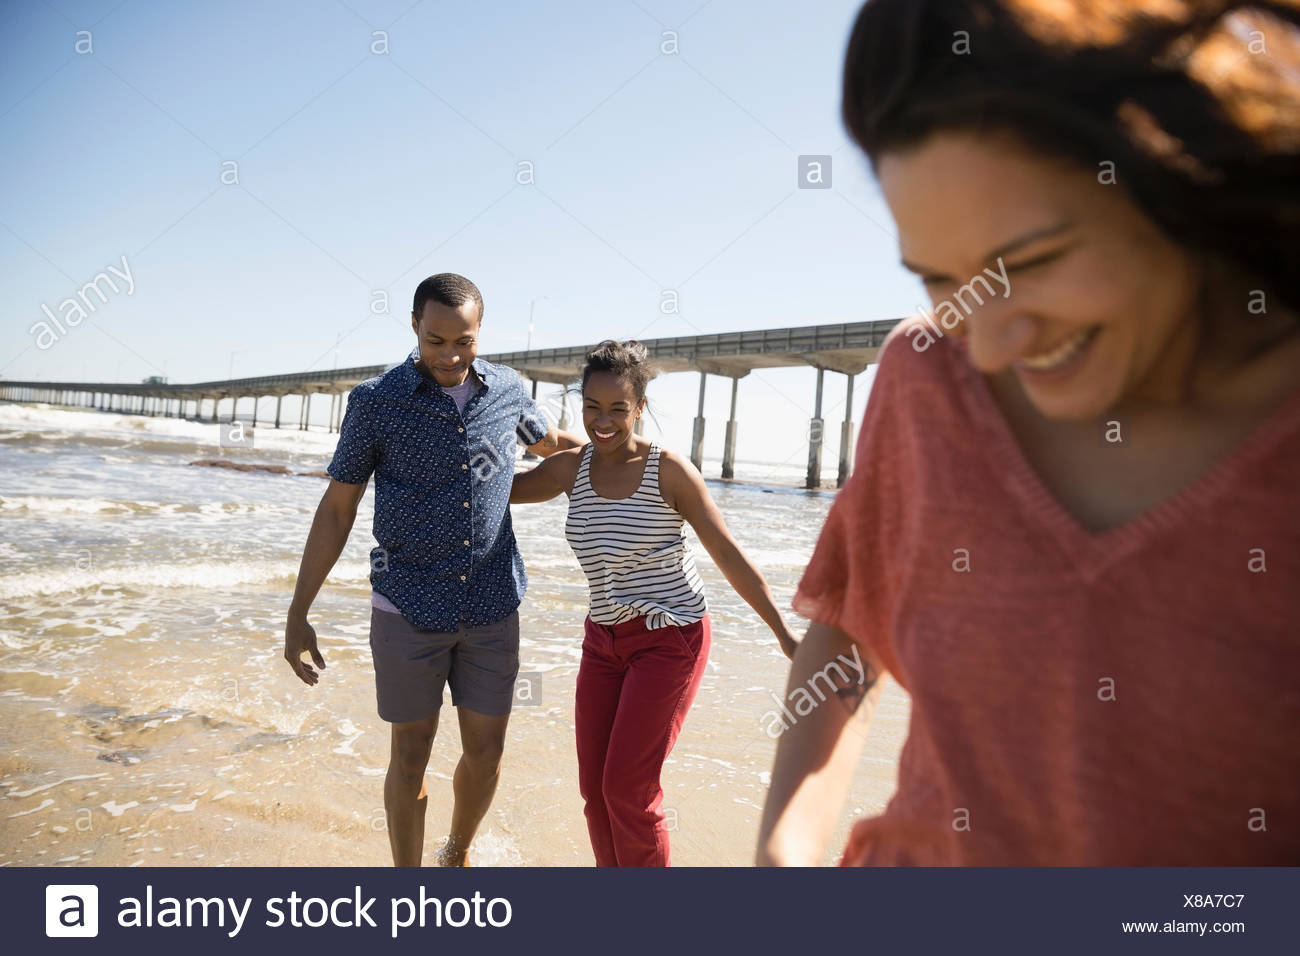 Couple walking on sunny beach - Stock Image